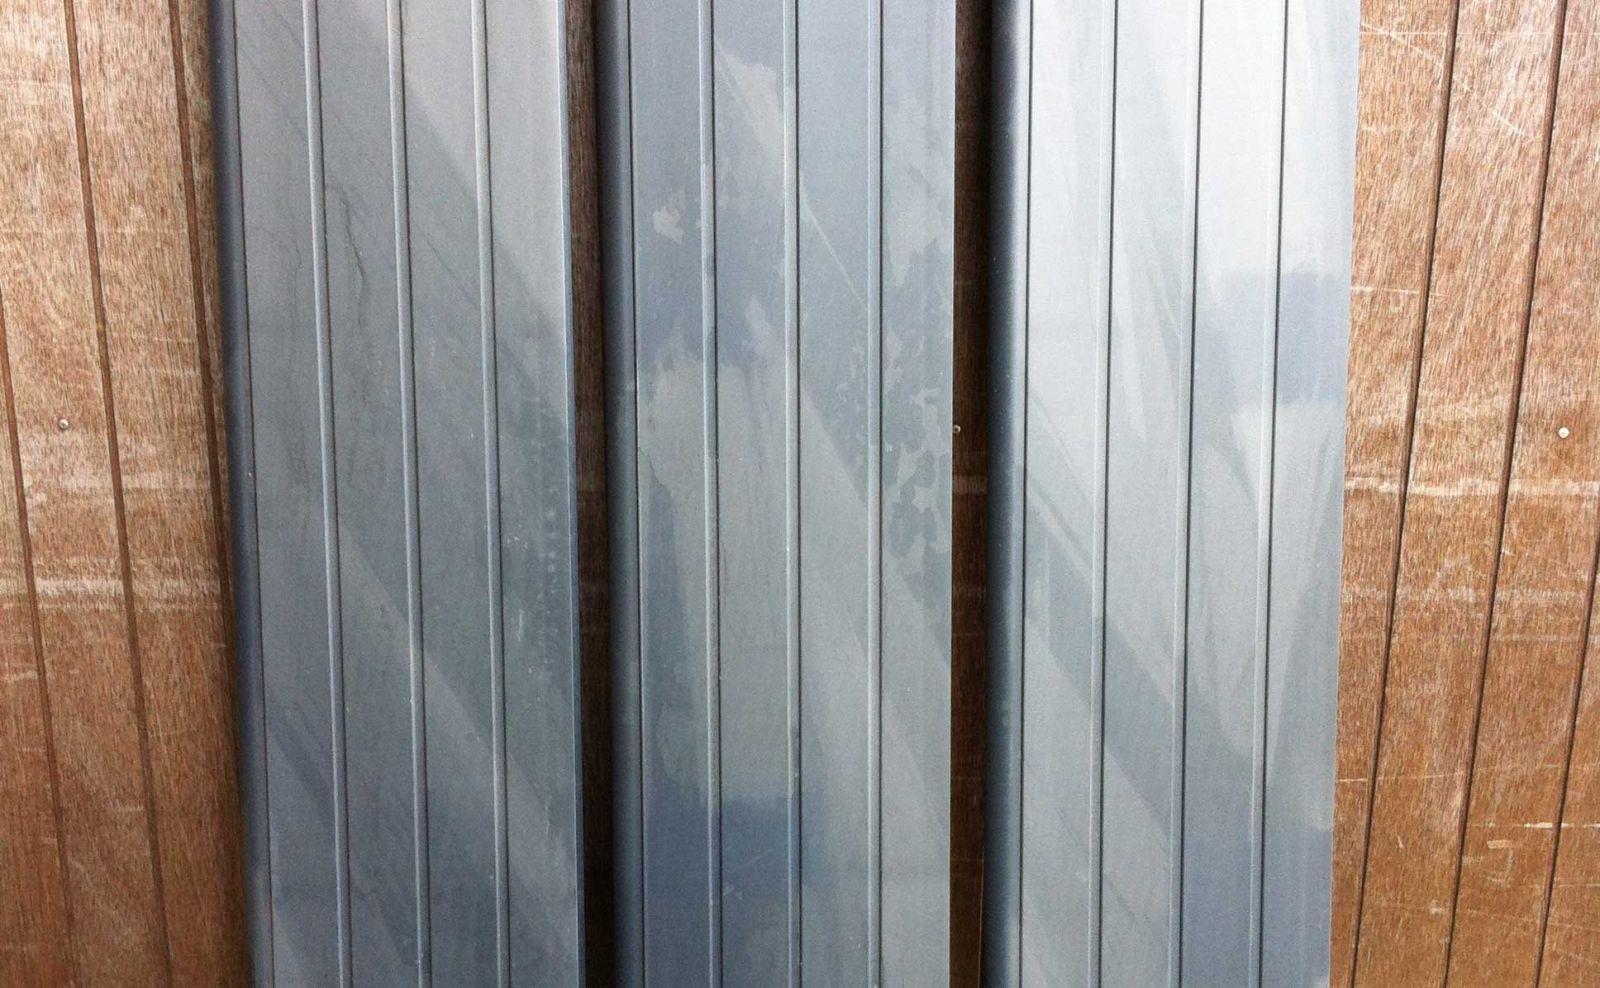 Eco Woodgrain Gravel Boards Pvc Fencing System Plastic